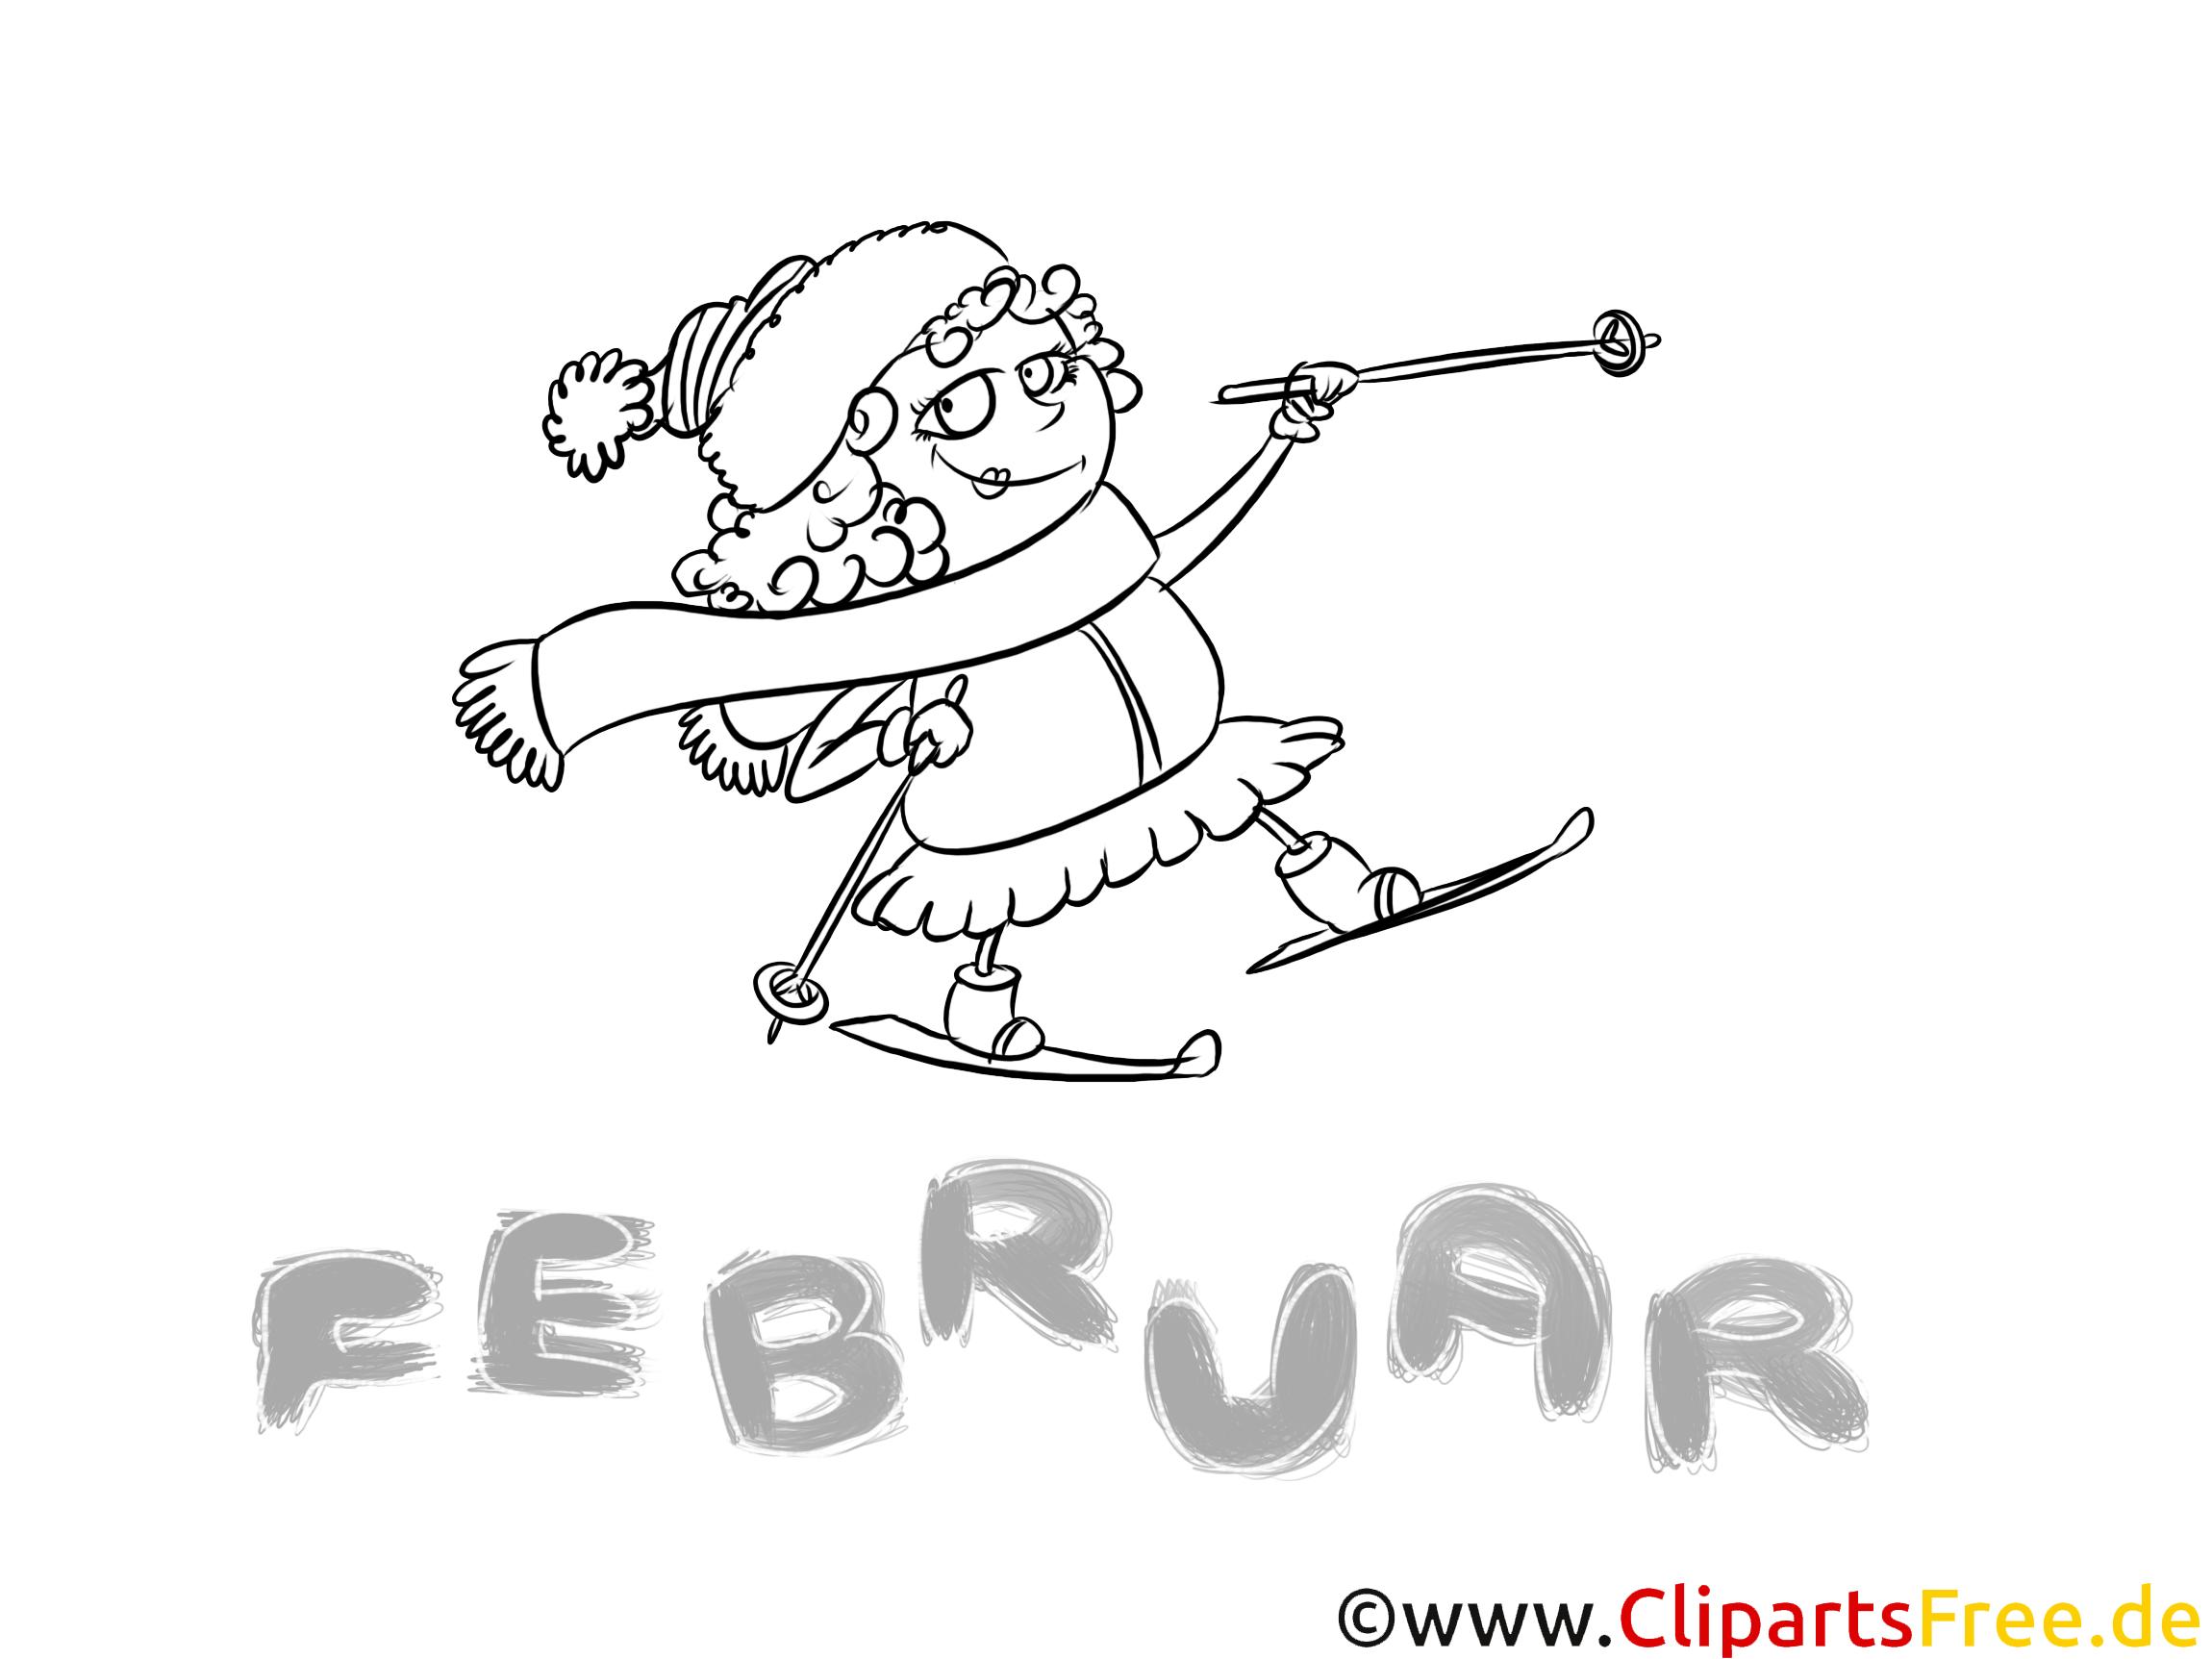 Februar Malbild Ausmalbilder Monate Jahreszeiten